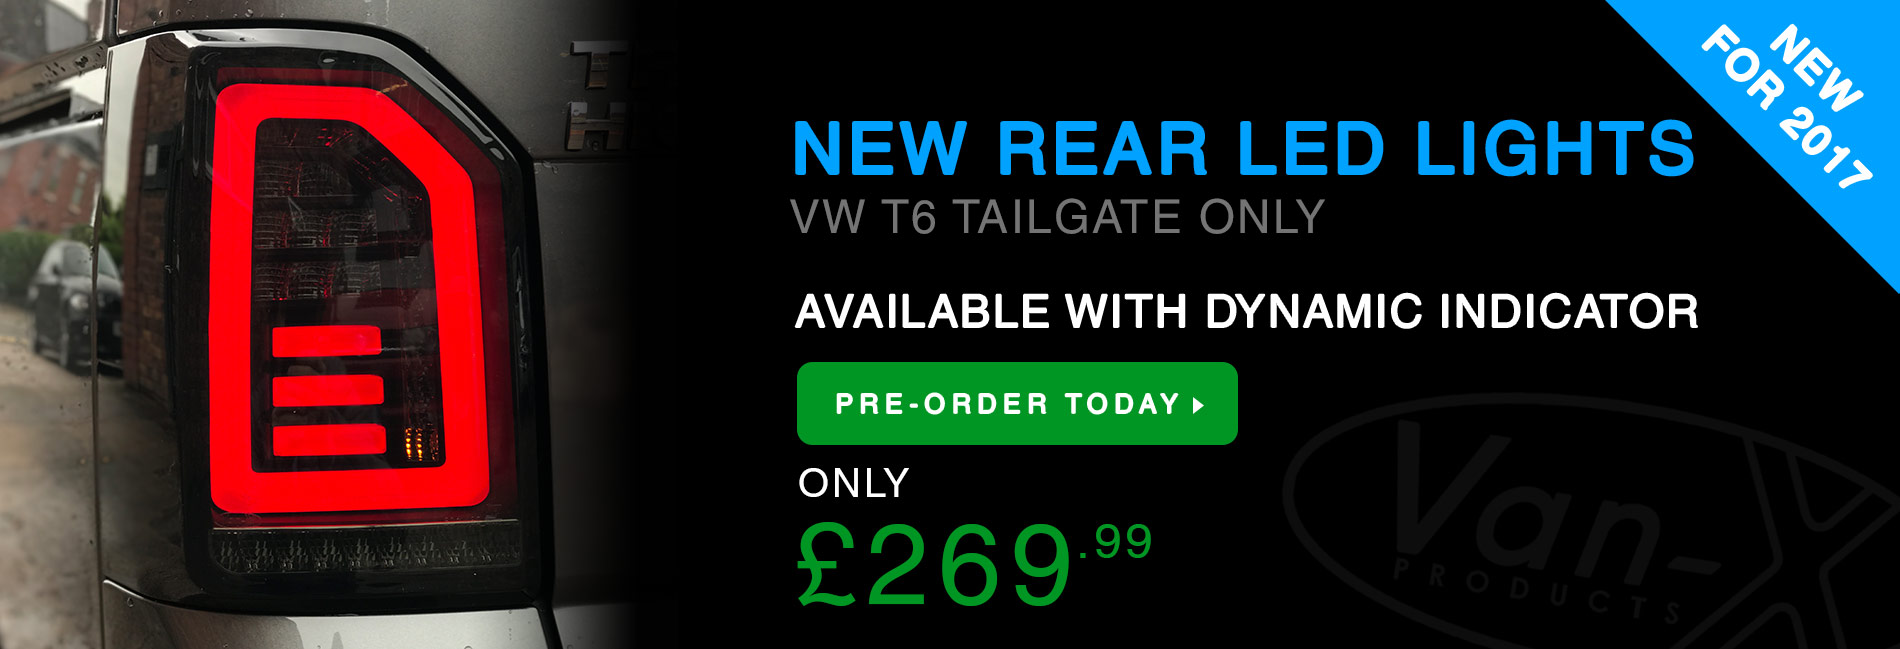 BRAND NEW: VW T6 DYNAMIC REAR LED LIGHTS